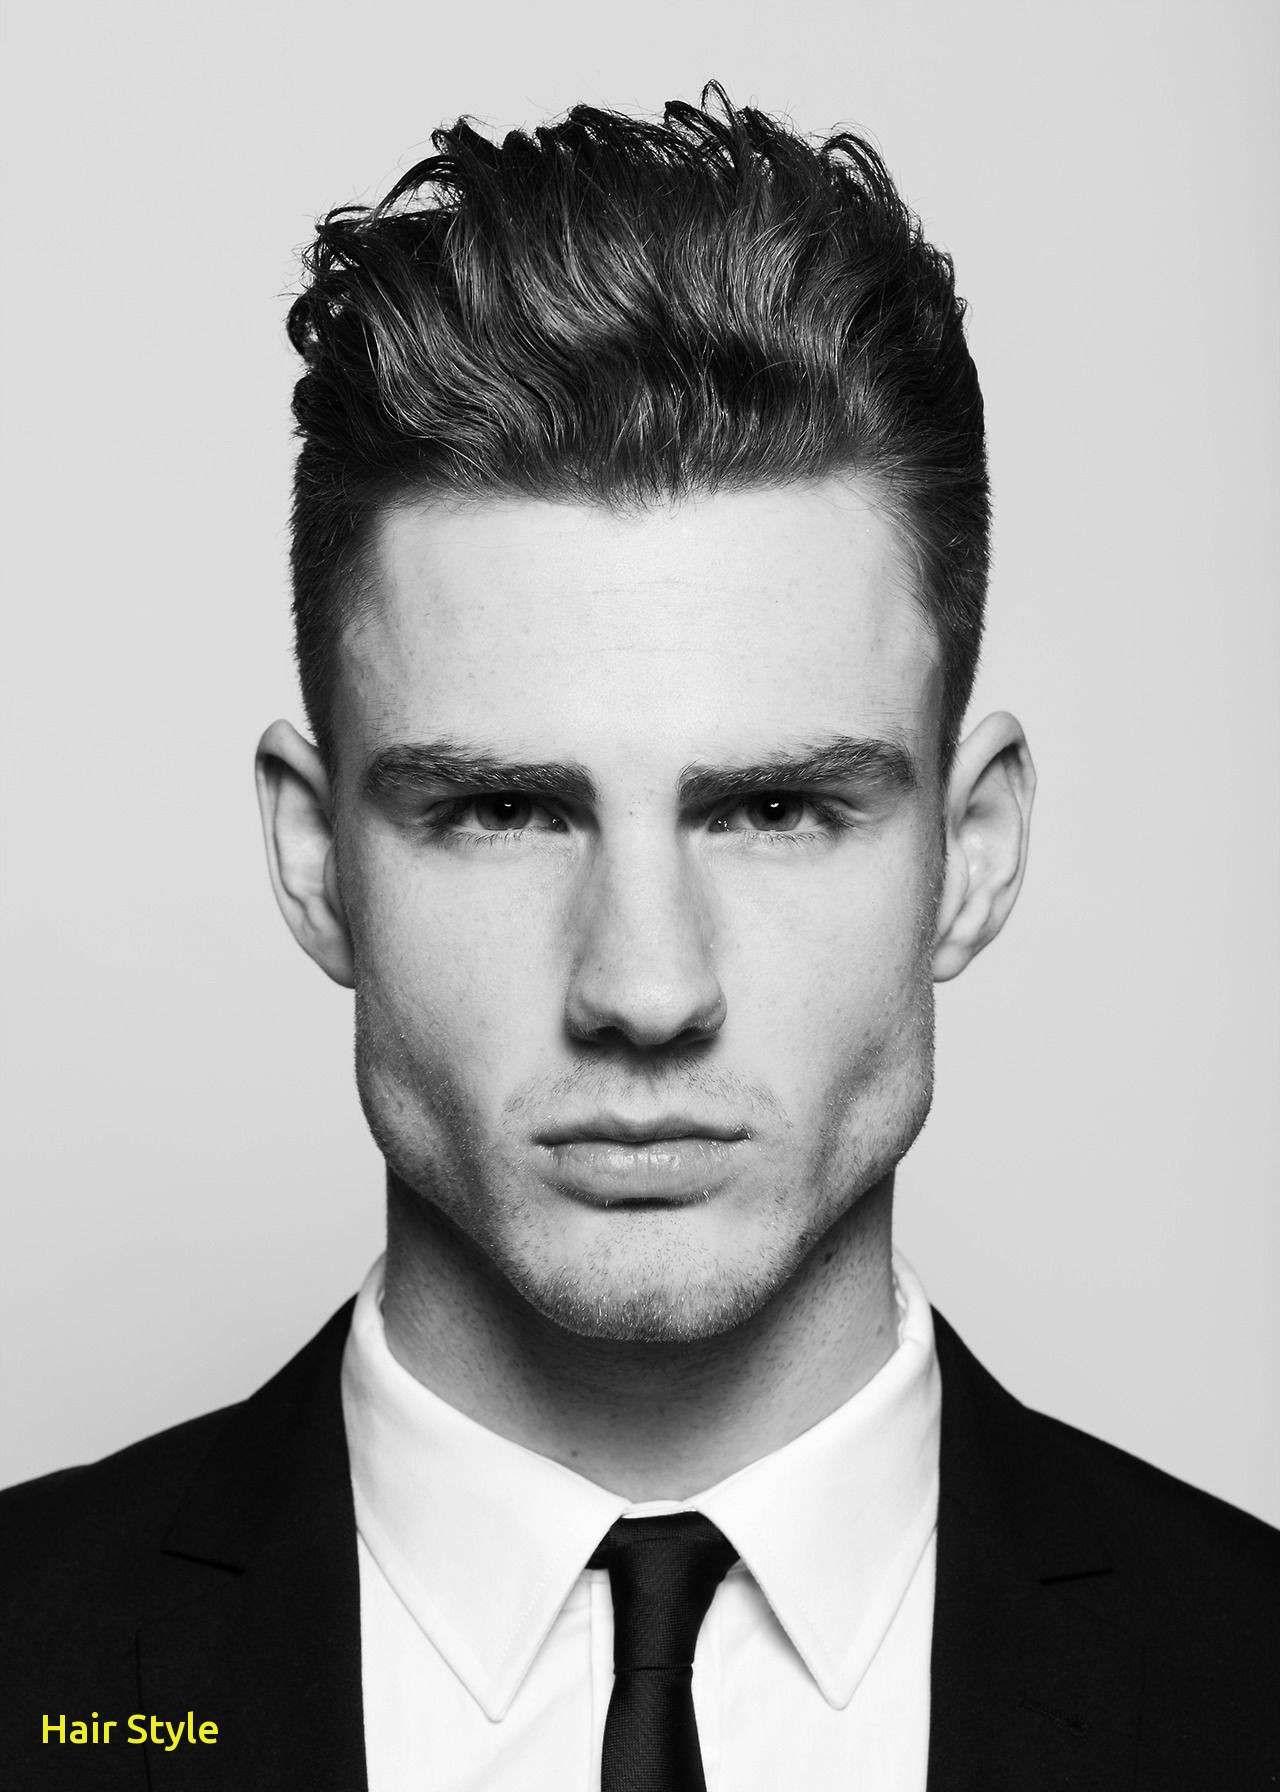 Schöne Frisur 2019 Männer Haartrends 2018 Pinterest Frisur